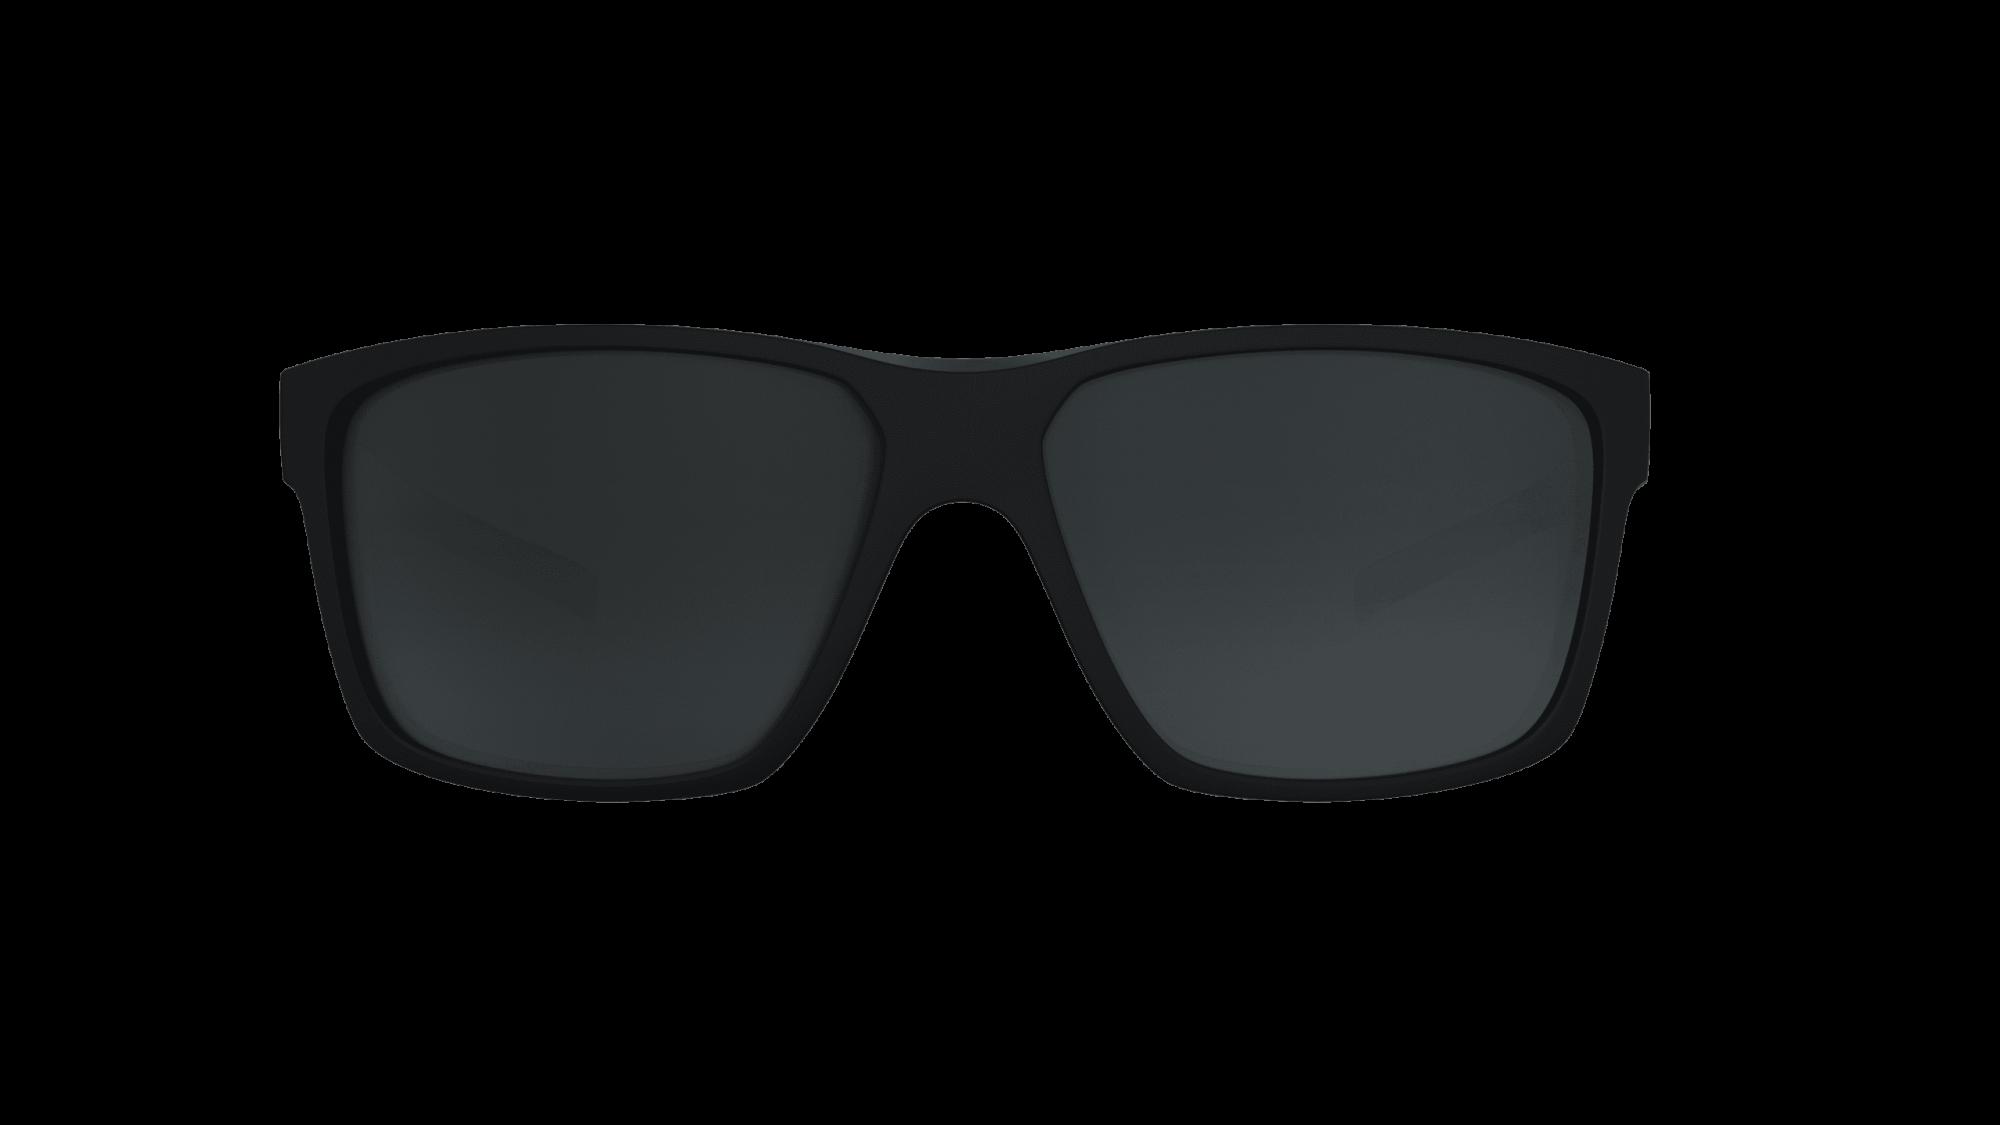 Óculos Freak HB Matte Black Gray